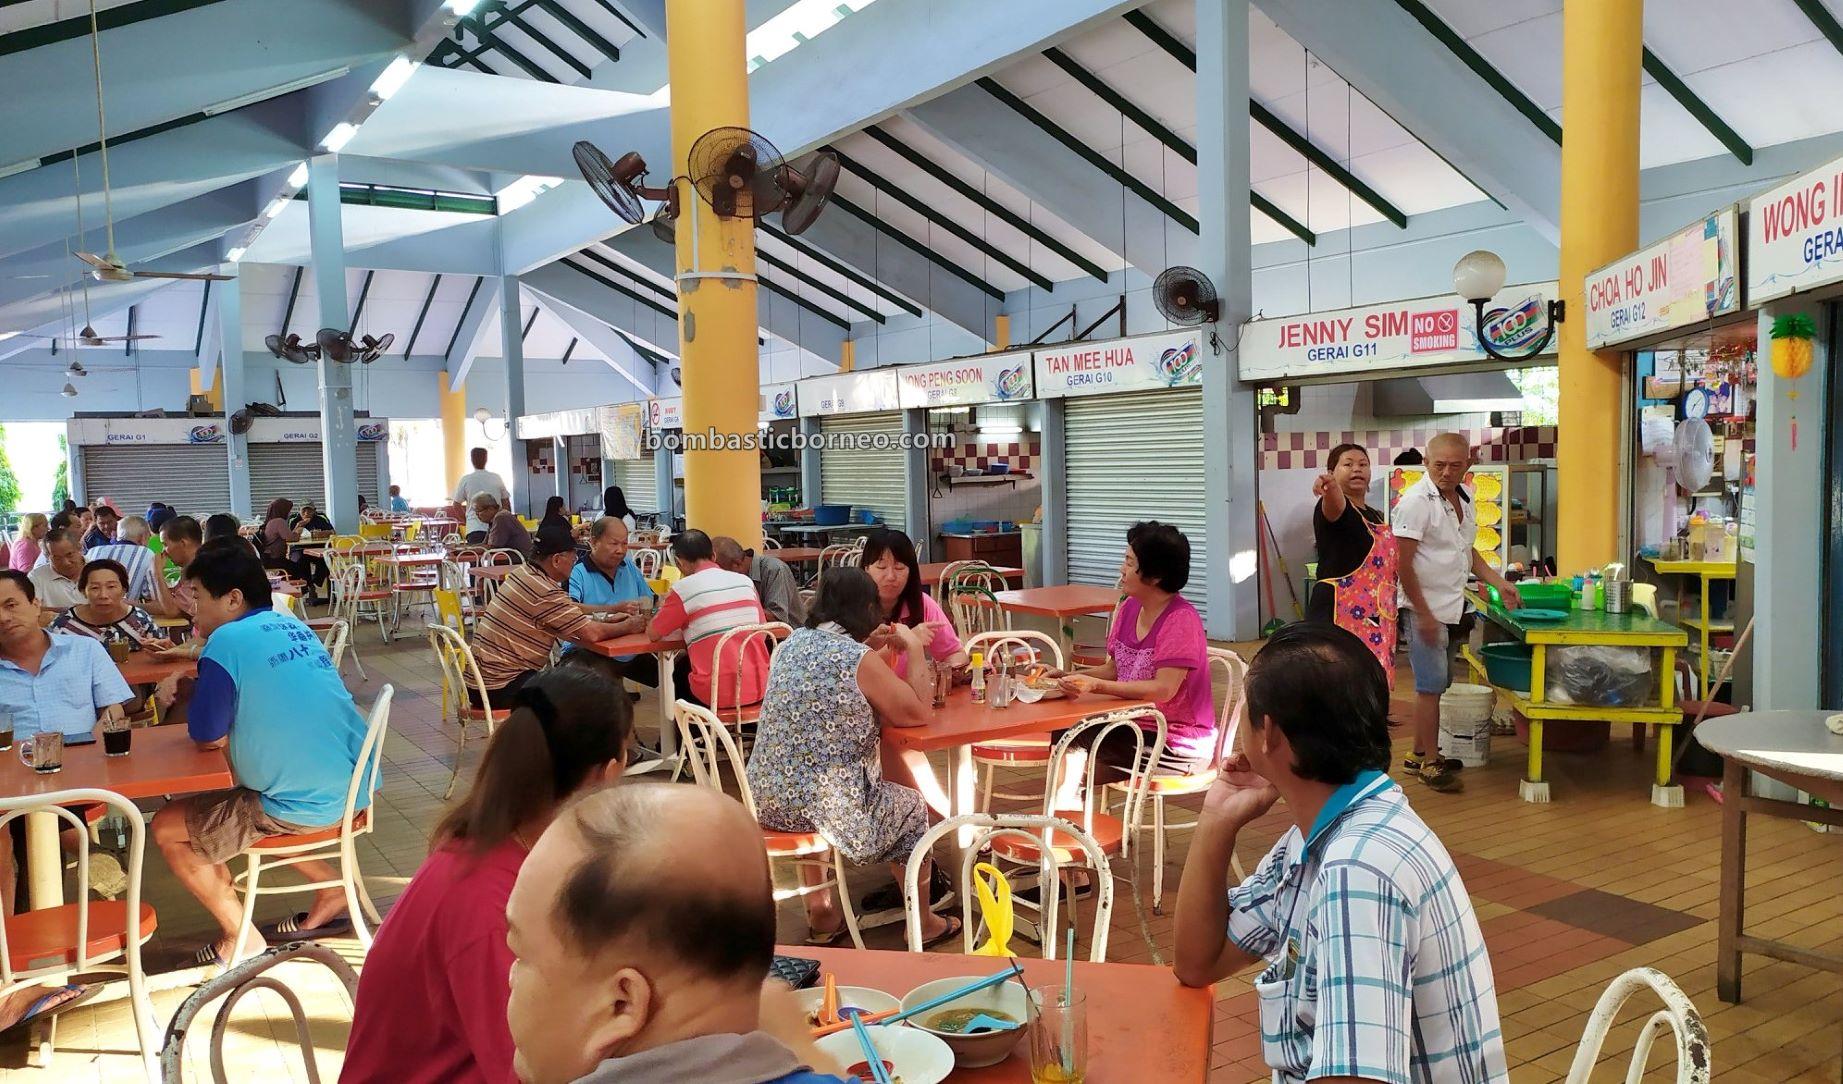 backpackers, Destination, exploration, Pasar tamu, local market, Miri, town, Tourism, tourist attraction, Borneo, 马来西亚砂拉越, 马鲁帝早市,